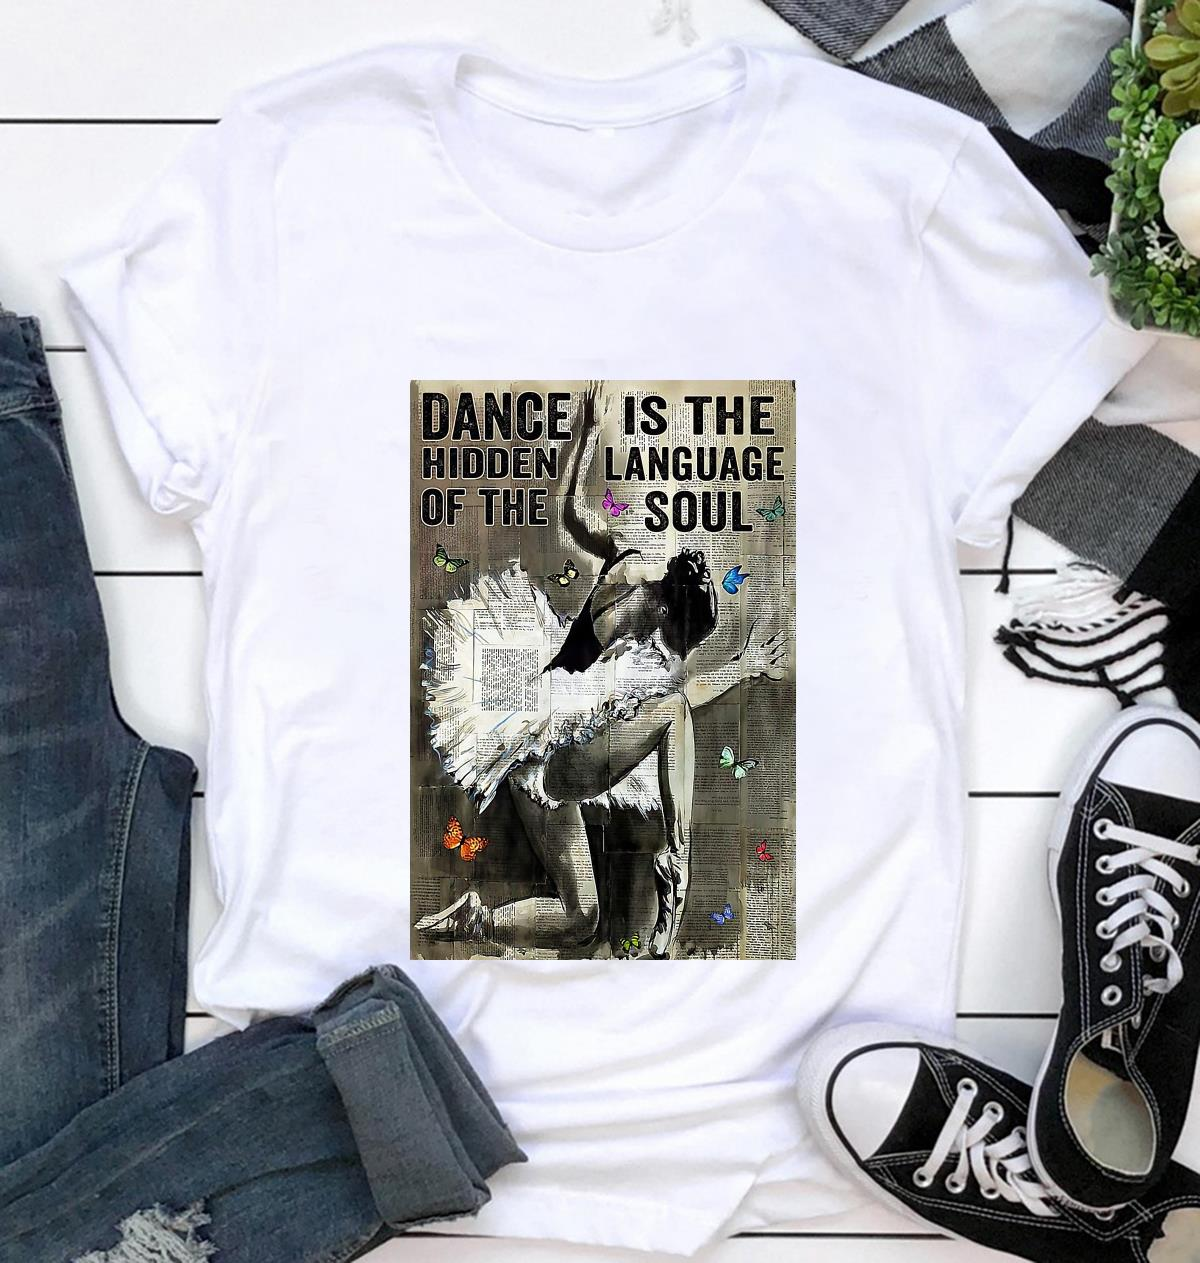 Ballet dance is hidden language of the soul poster t-shirt